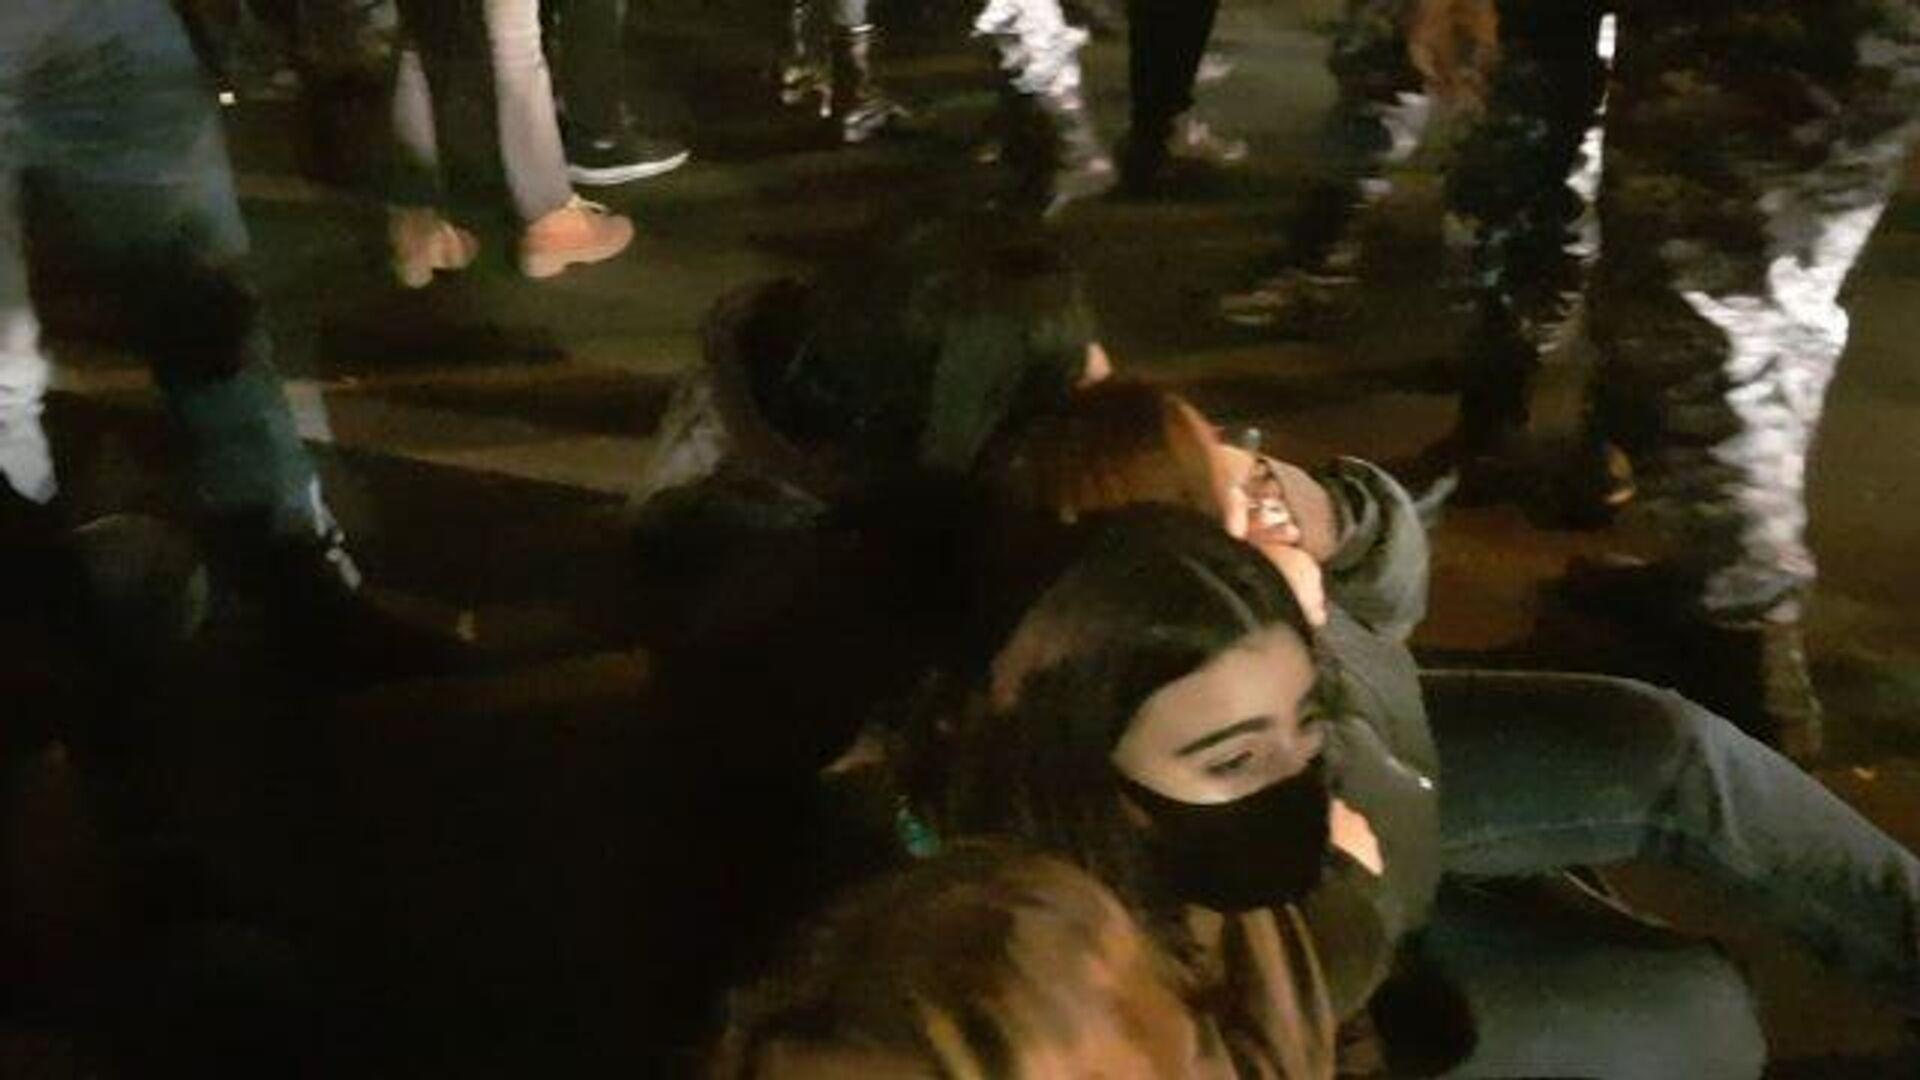 Протестующих начали задерживать на проспекте Тигран Мец в Ереване - РИА Новости, 1920, 03.12.2020